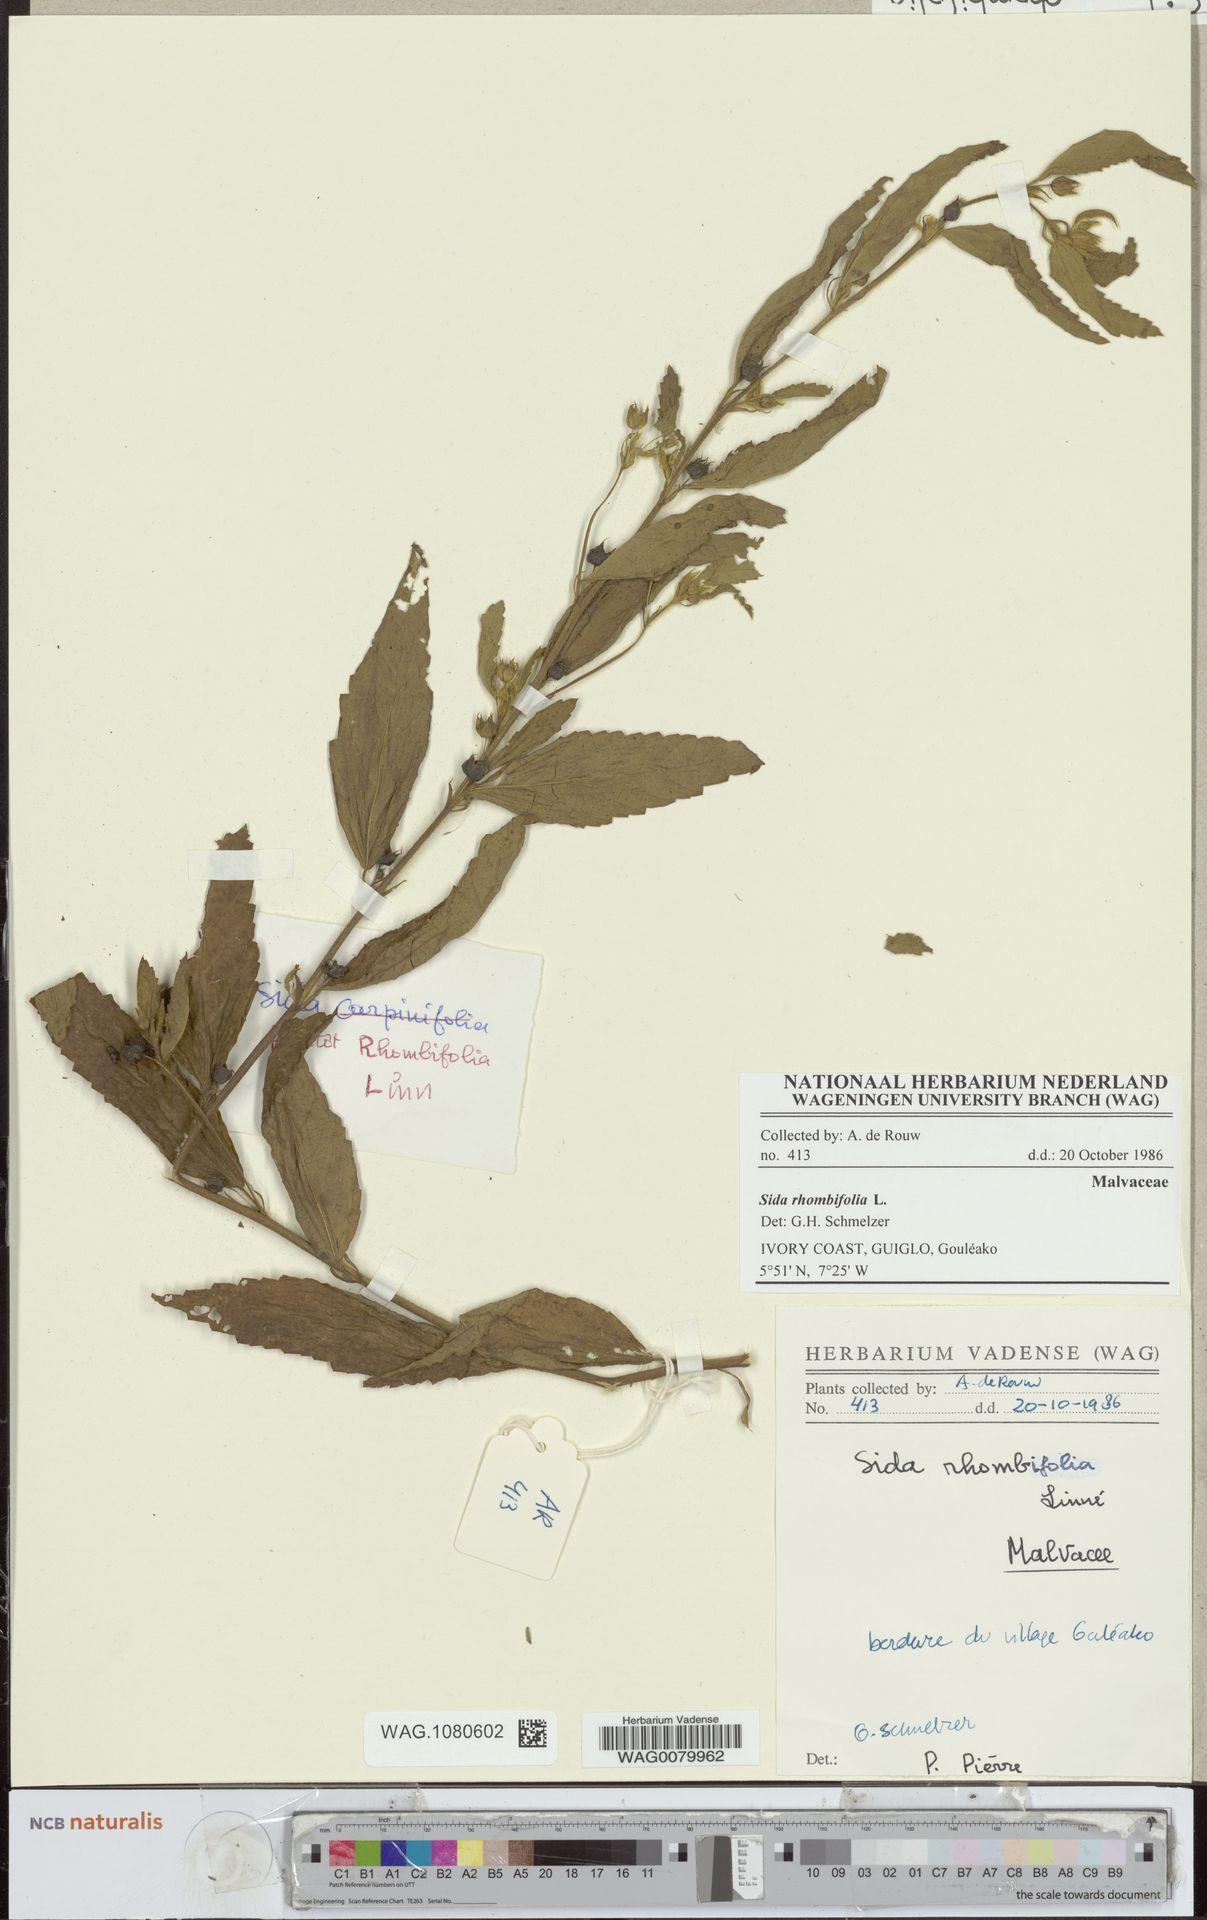 WAG.1080602   Sida rhombifolia L.